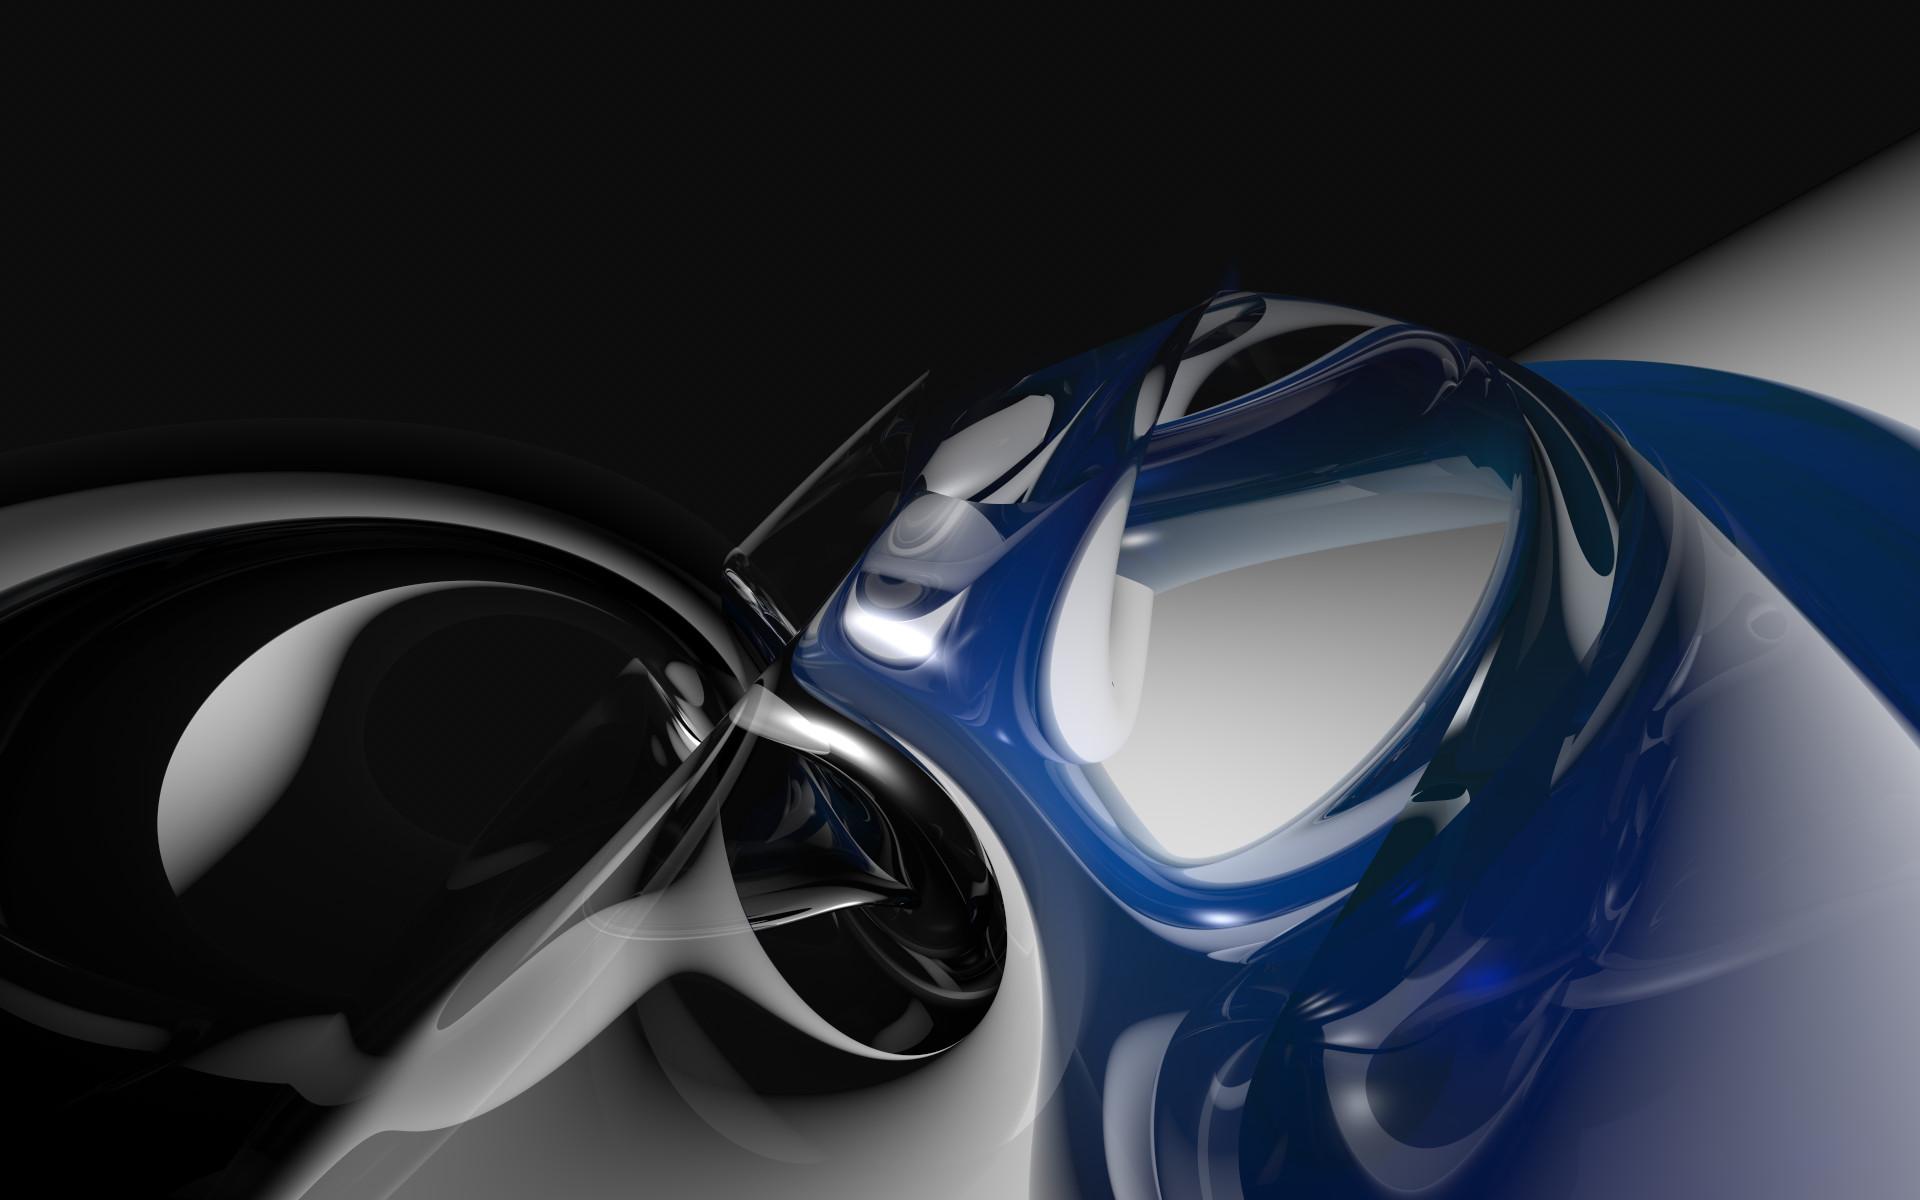 Abstract 3D Wallpaper